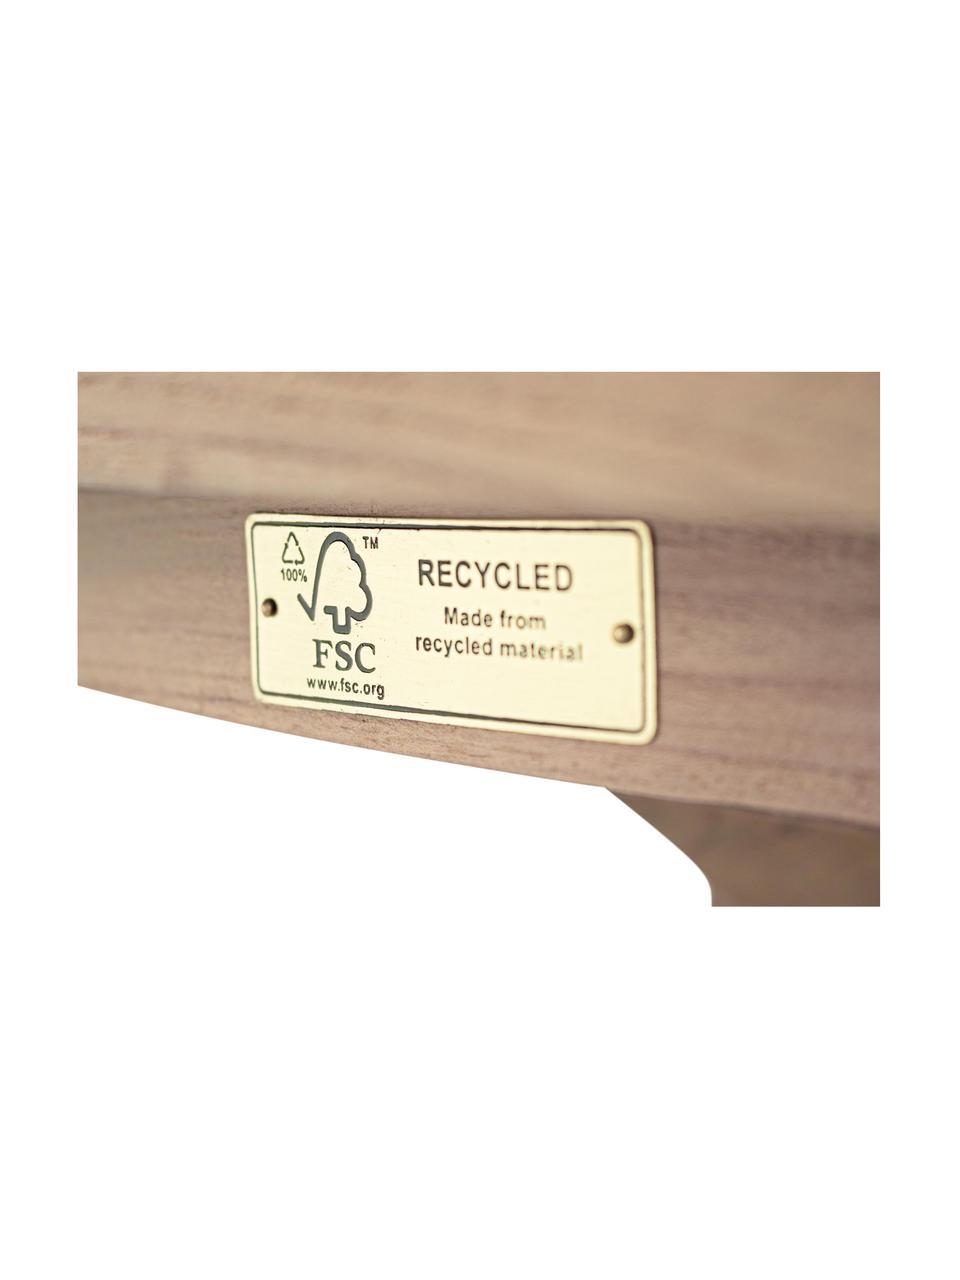 Runder Esstisch Rift mit recycelter Teakholzplatte, Teakholz, recycled und FSC-zertifiziert, Recyceltes Teakholz, Ø 135 x H 76 cm